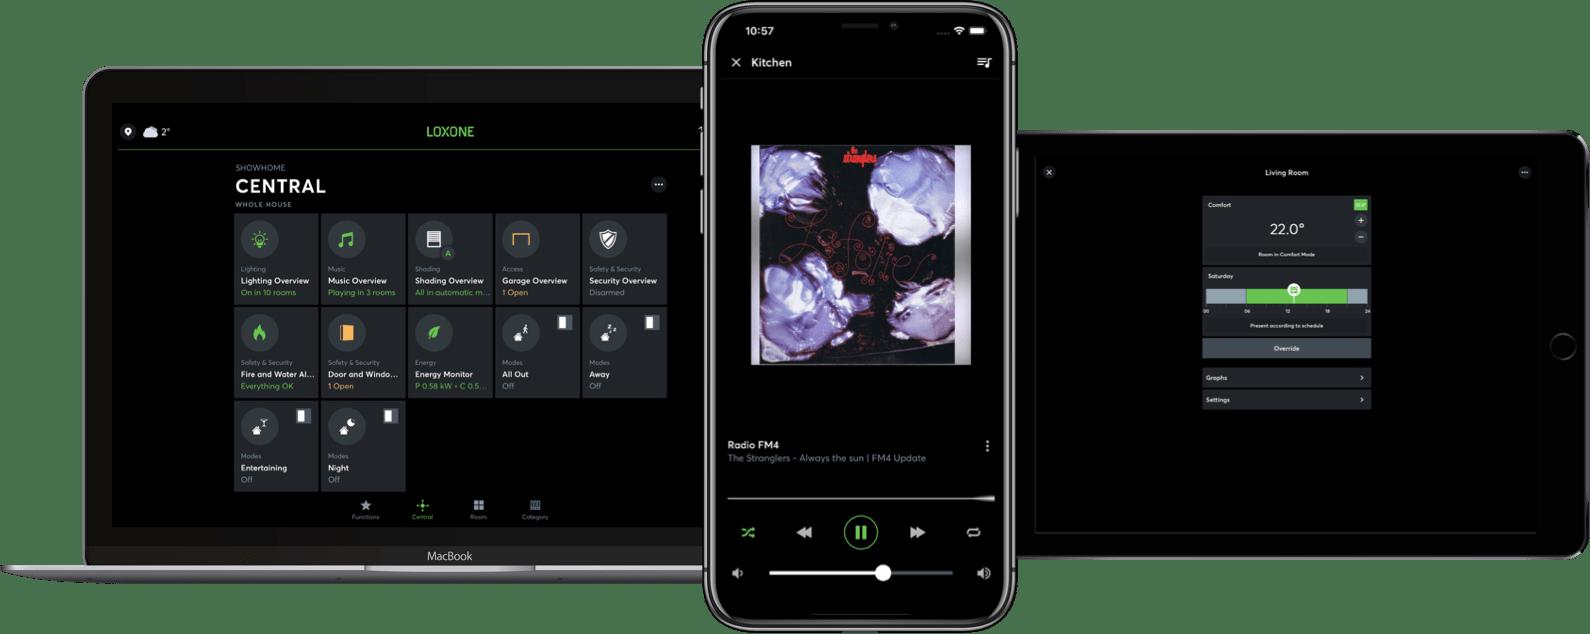 Smart Home App für Android, iOS uvm